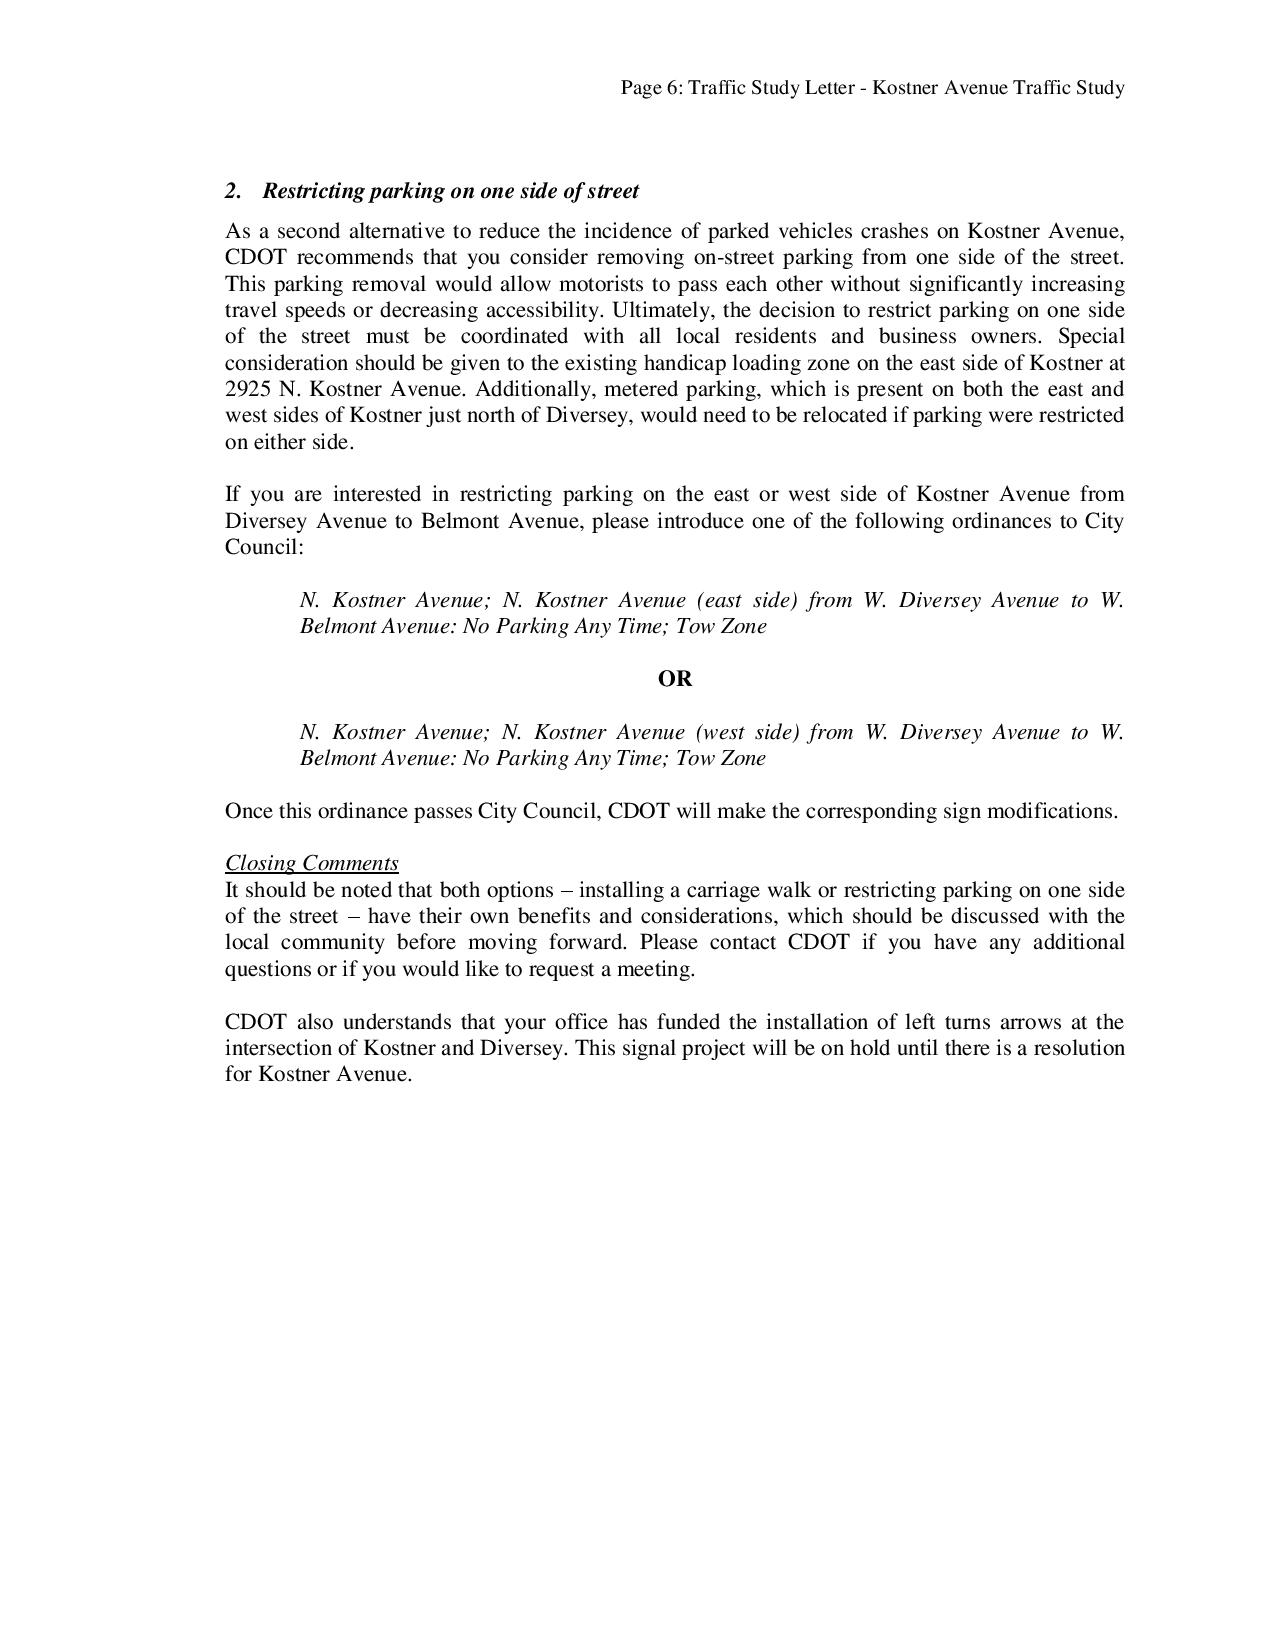 Kostner_Avenue_Traffic_Study_Letter-page-006.jpg